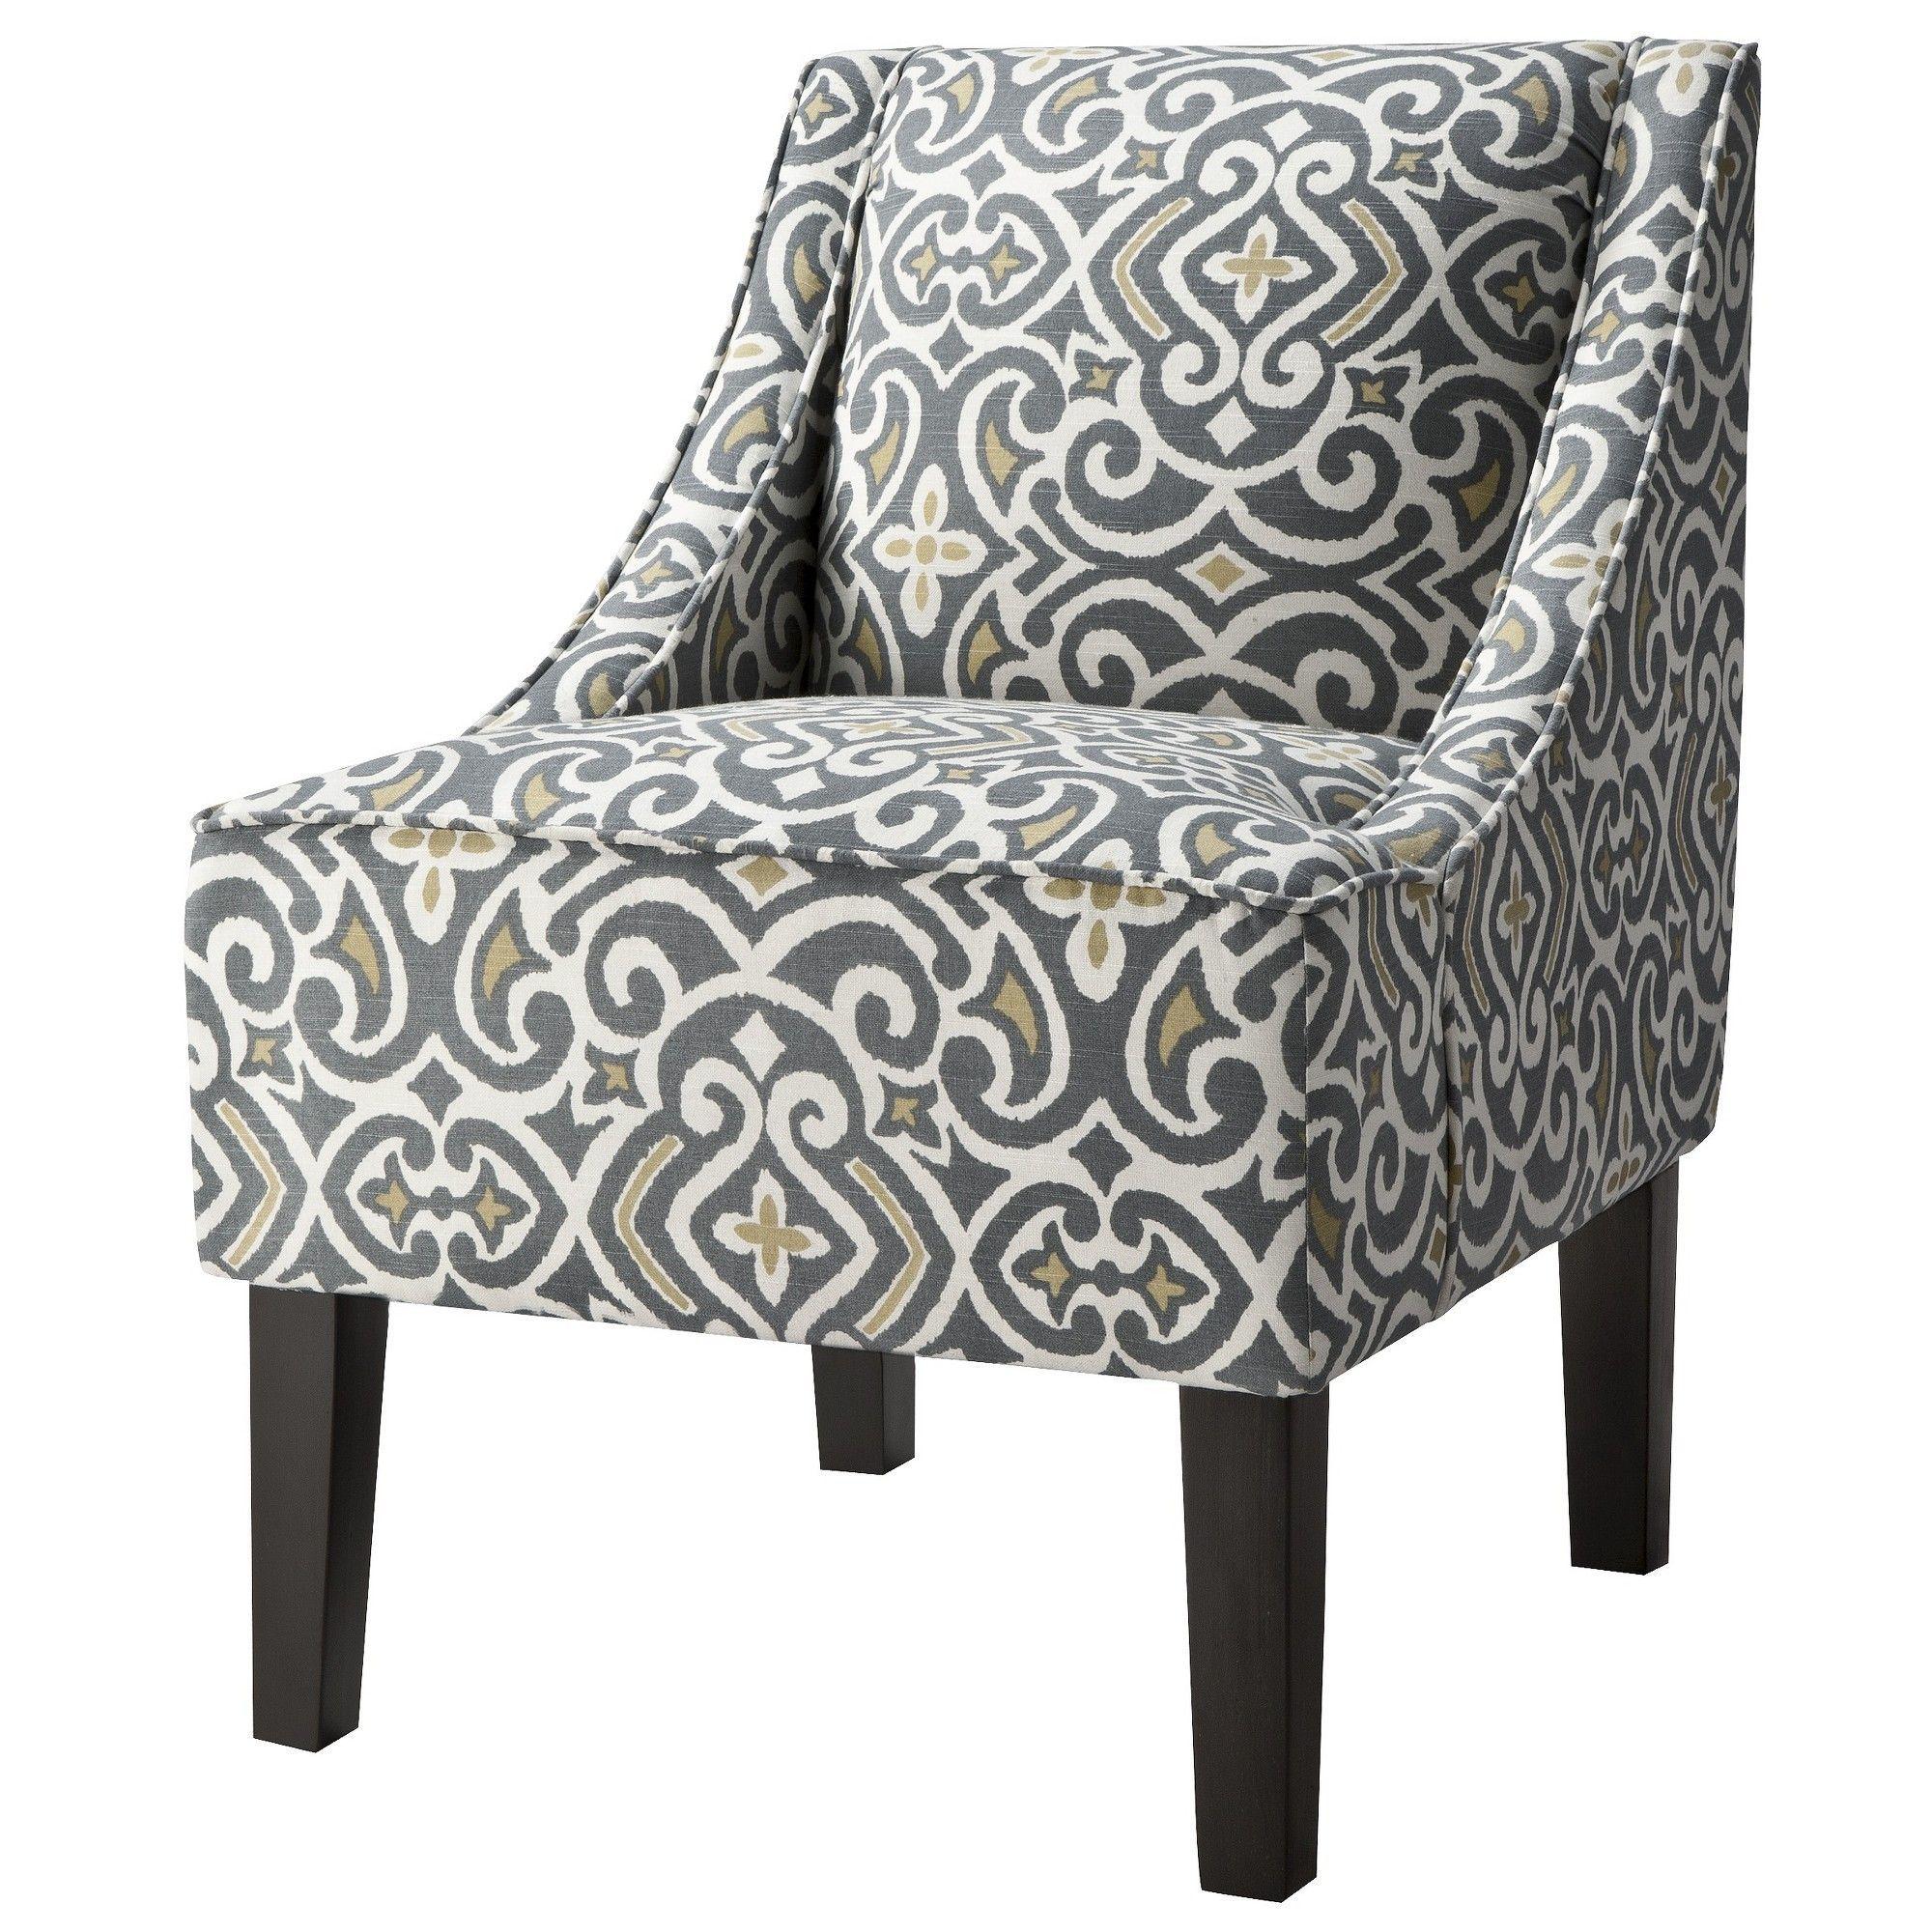 Hudson Swoop Arm Chair - Threshold